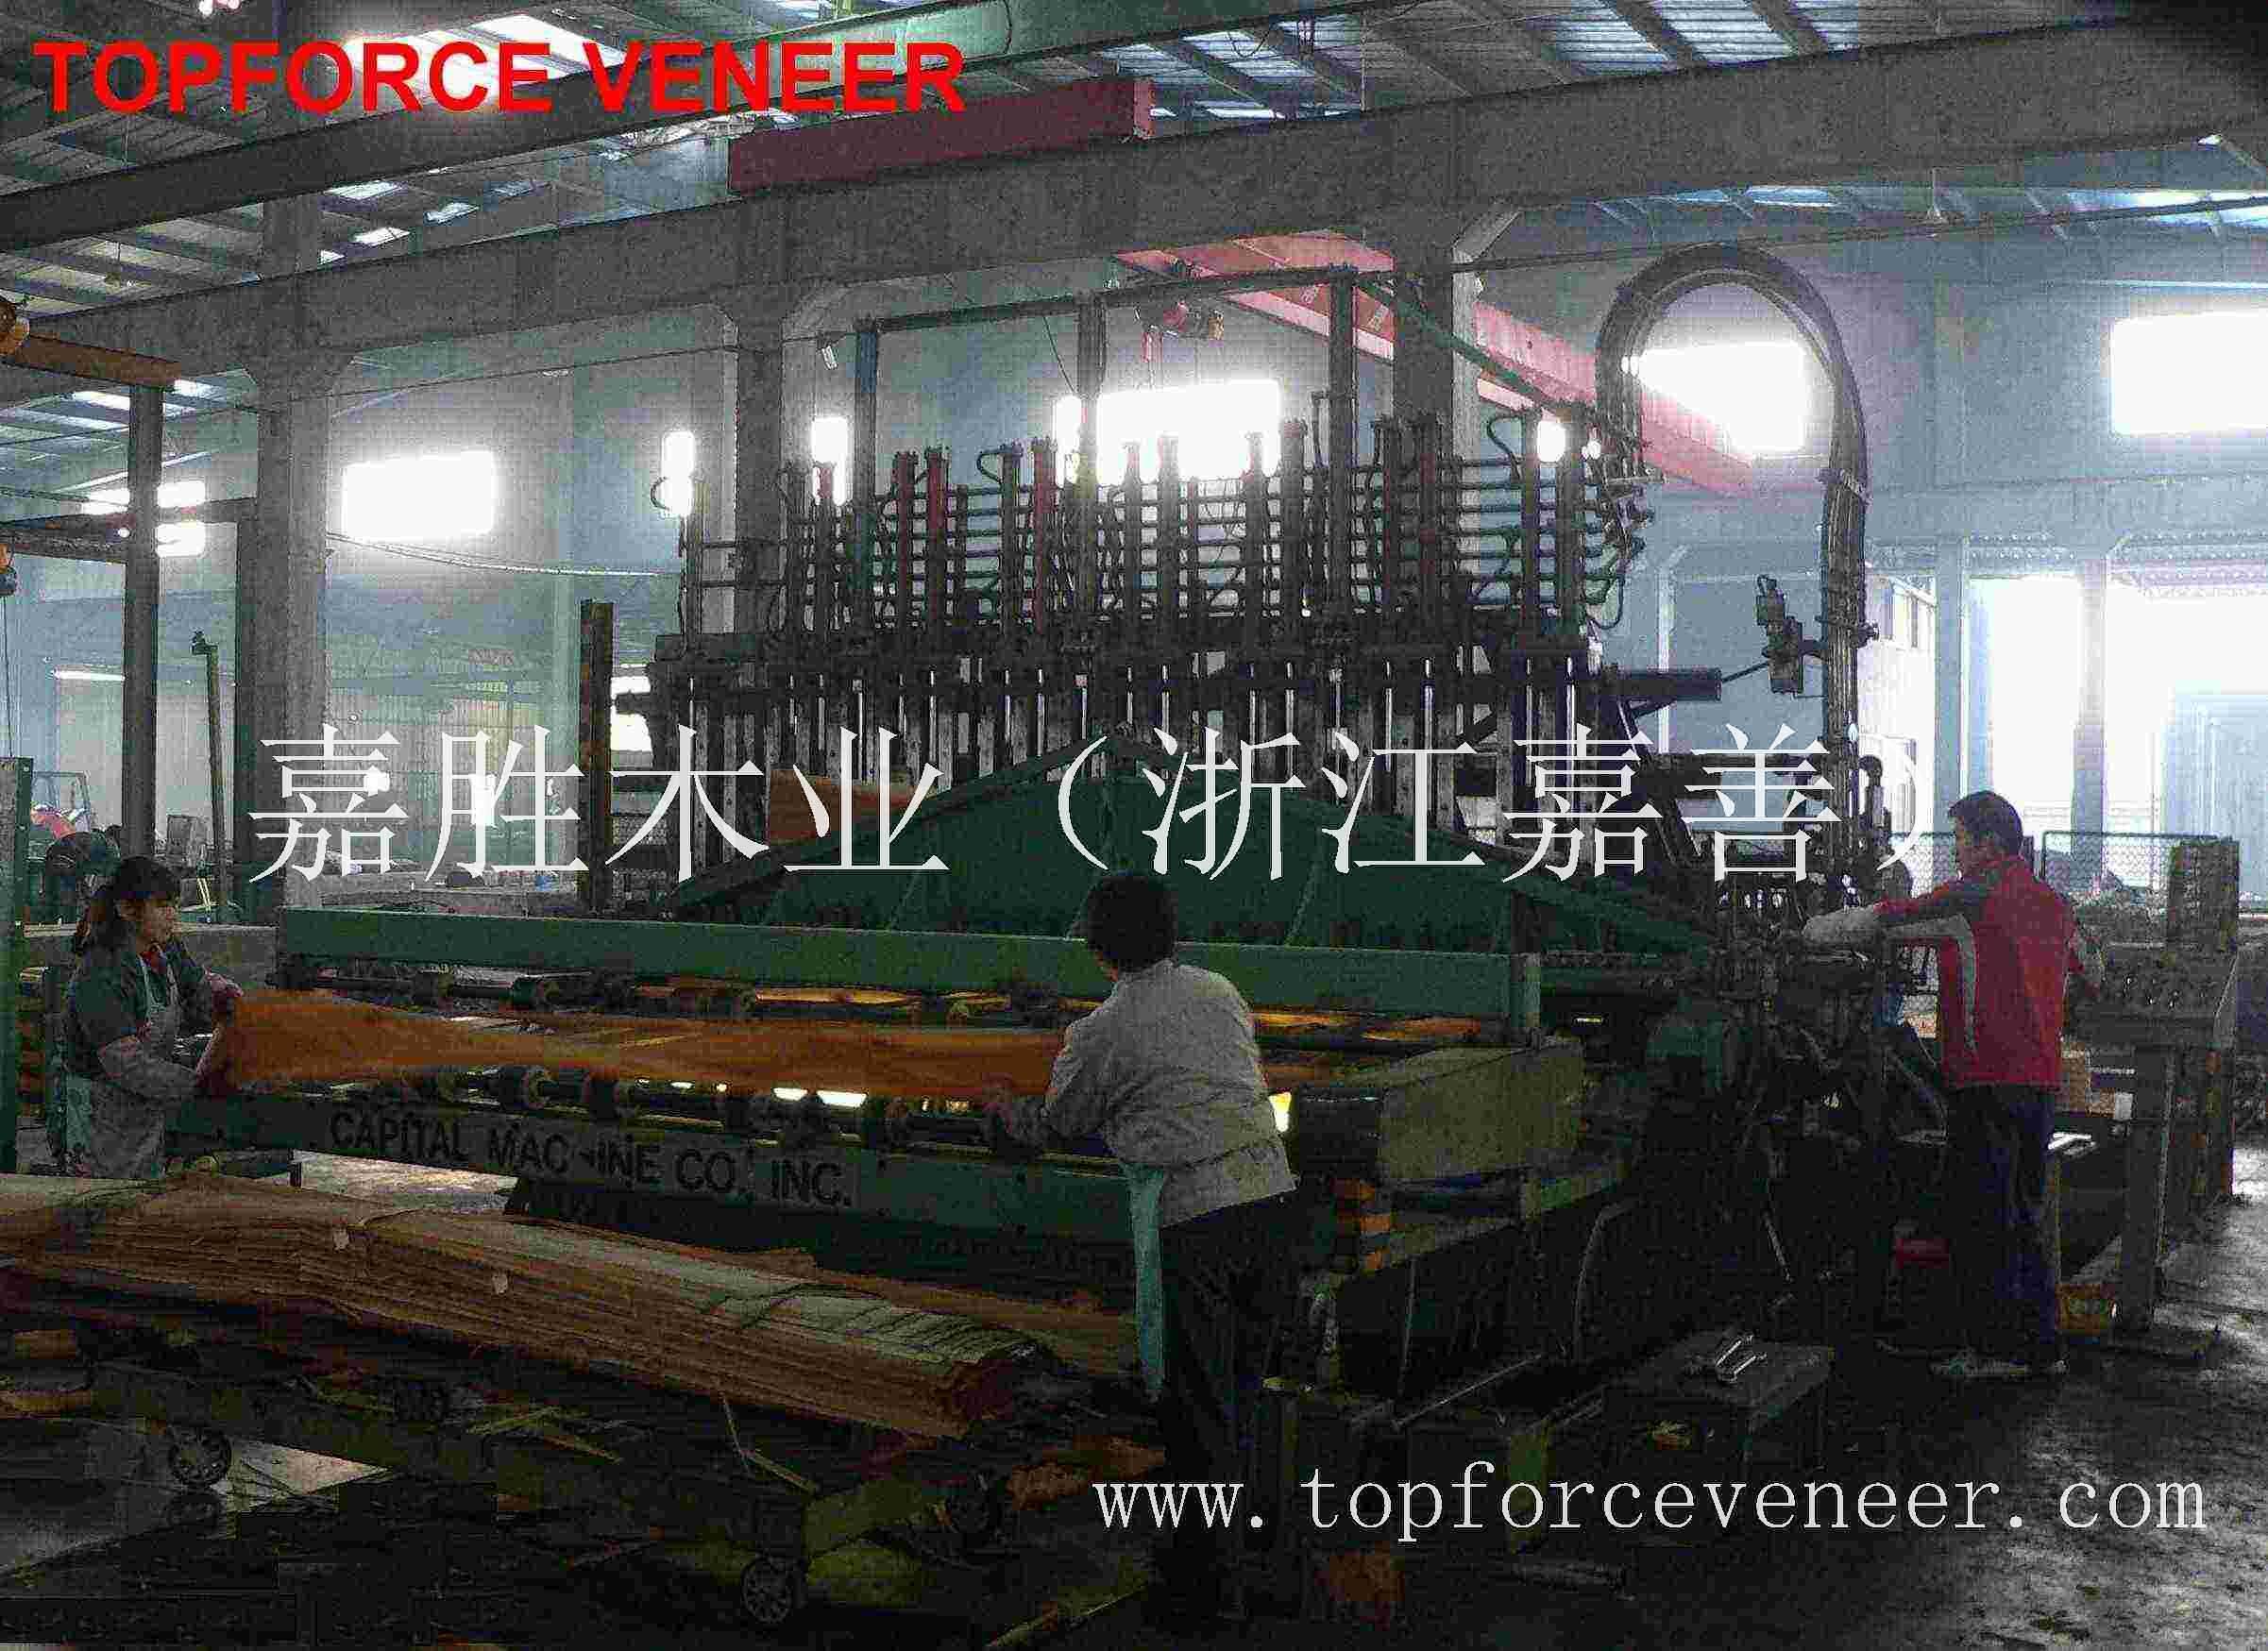 嘉兴原木木皮加工厂 JiaXing Veneer Logs Slicing Into Veneers Mill Factory